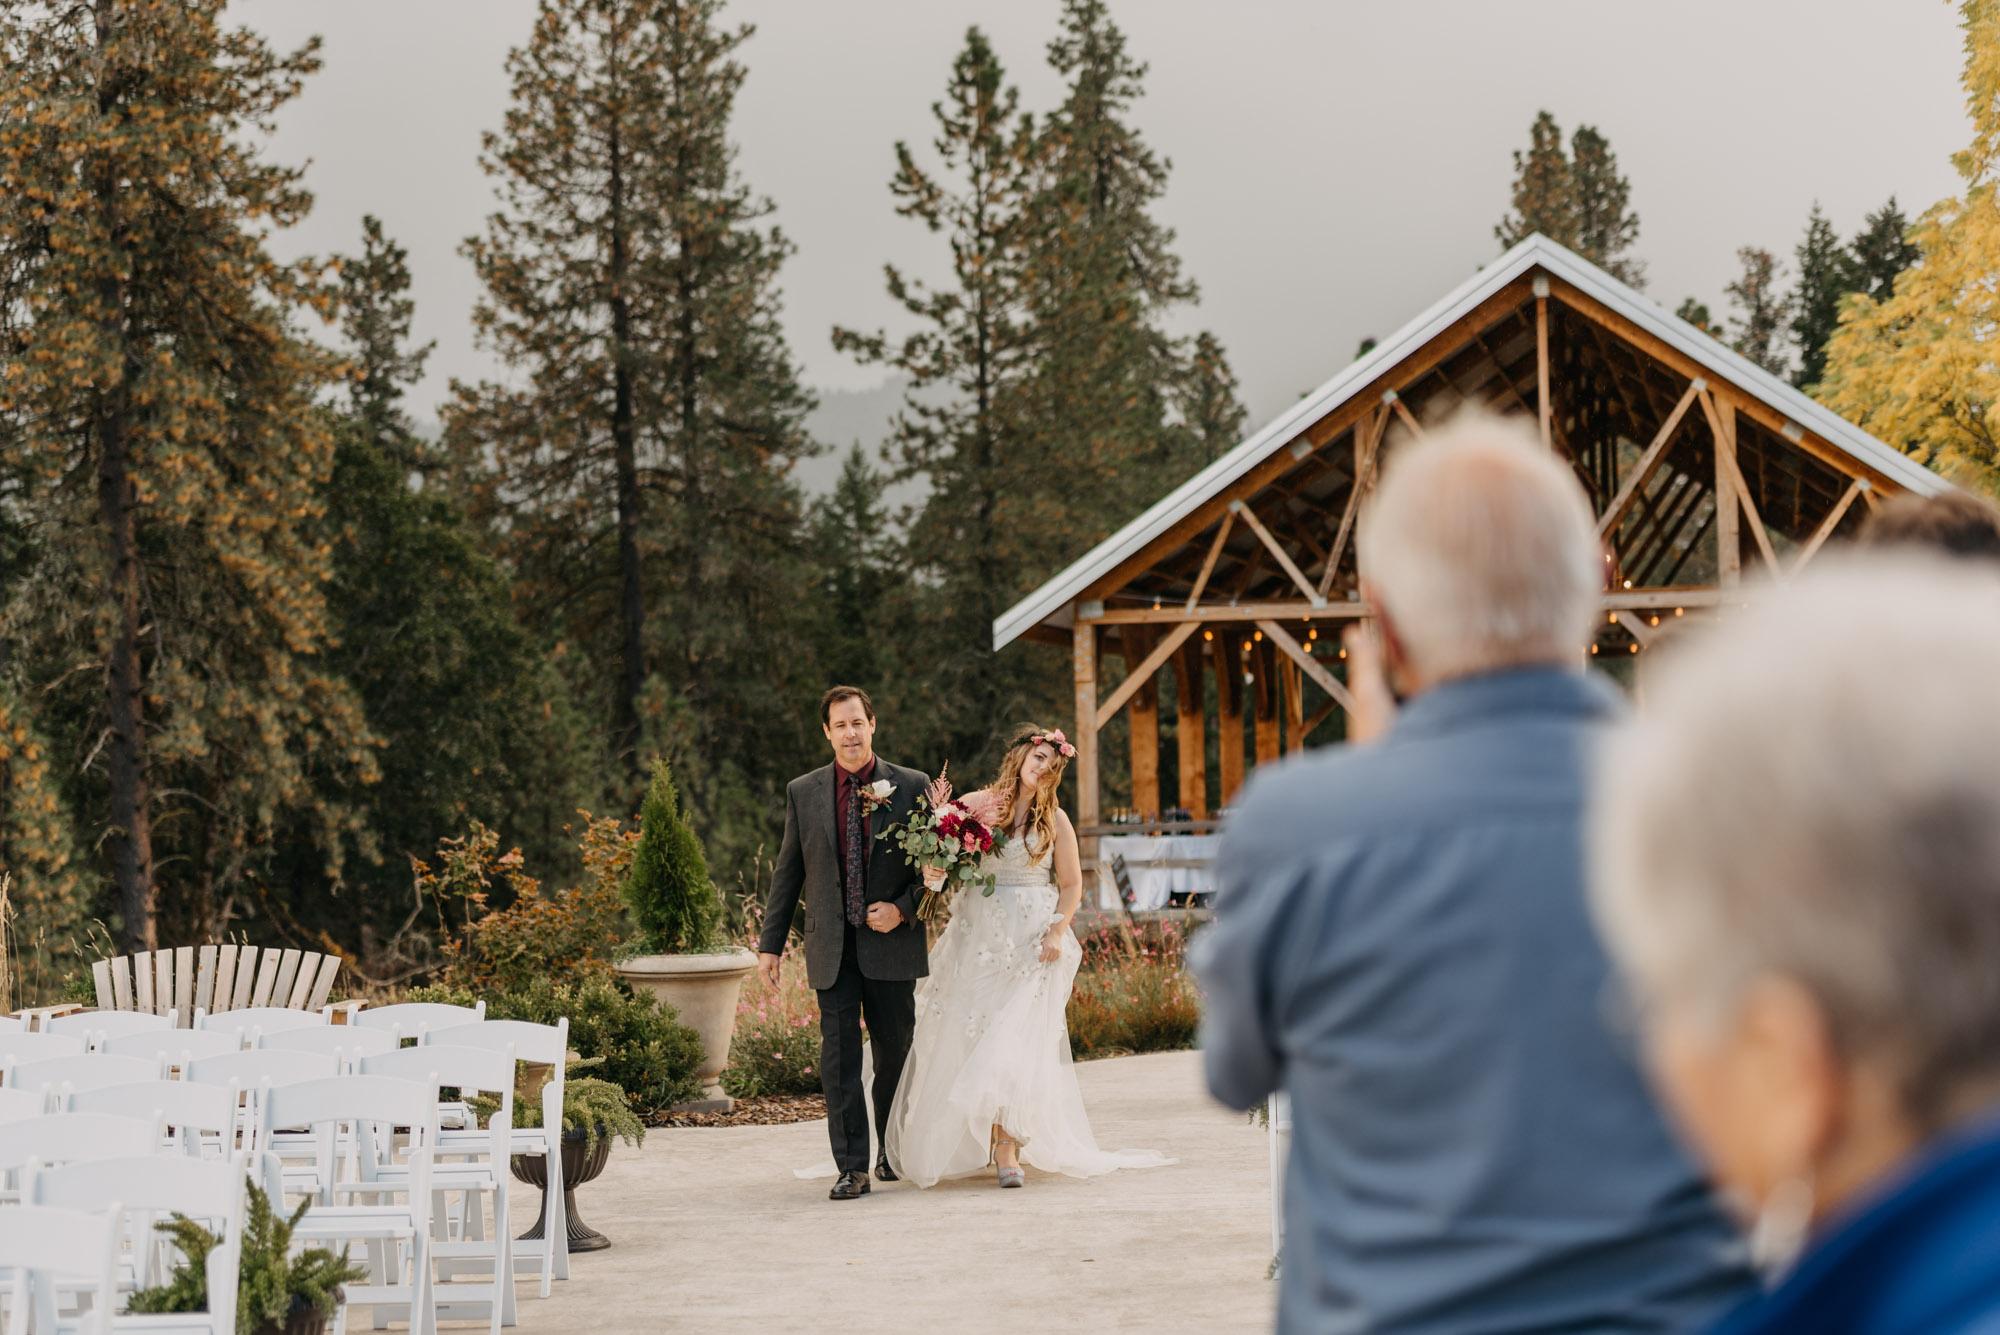 Outdoor-Summer-Ceremony-Washington-Wedding-Rainbow-8921.jpg